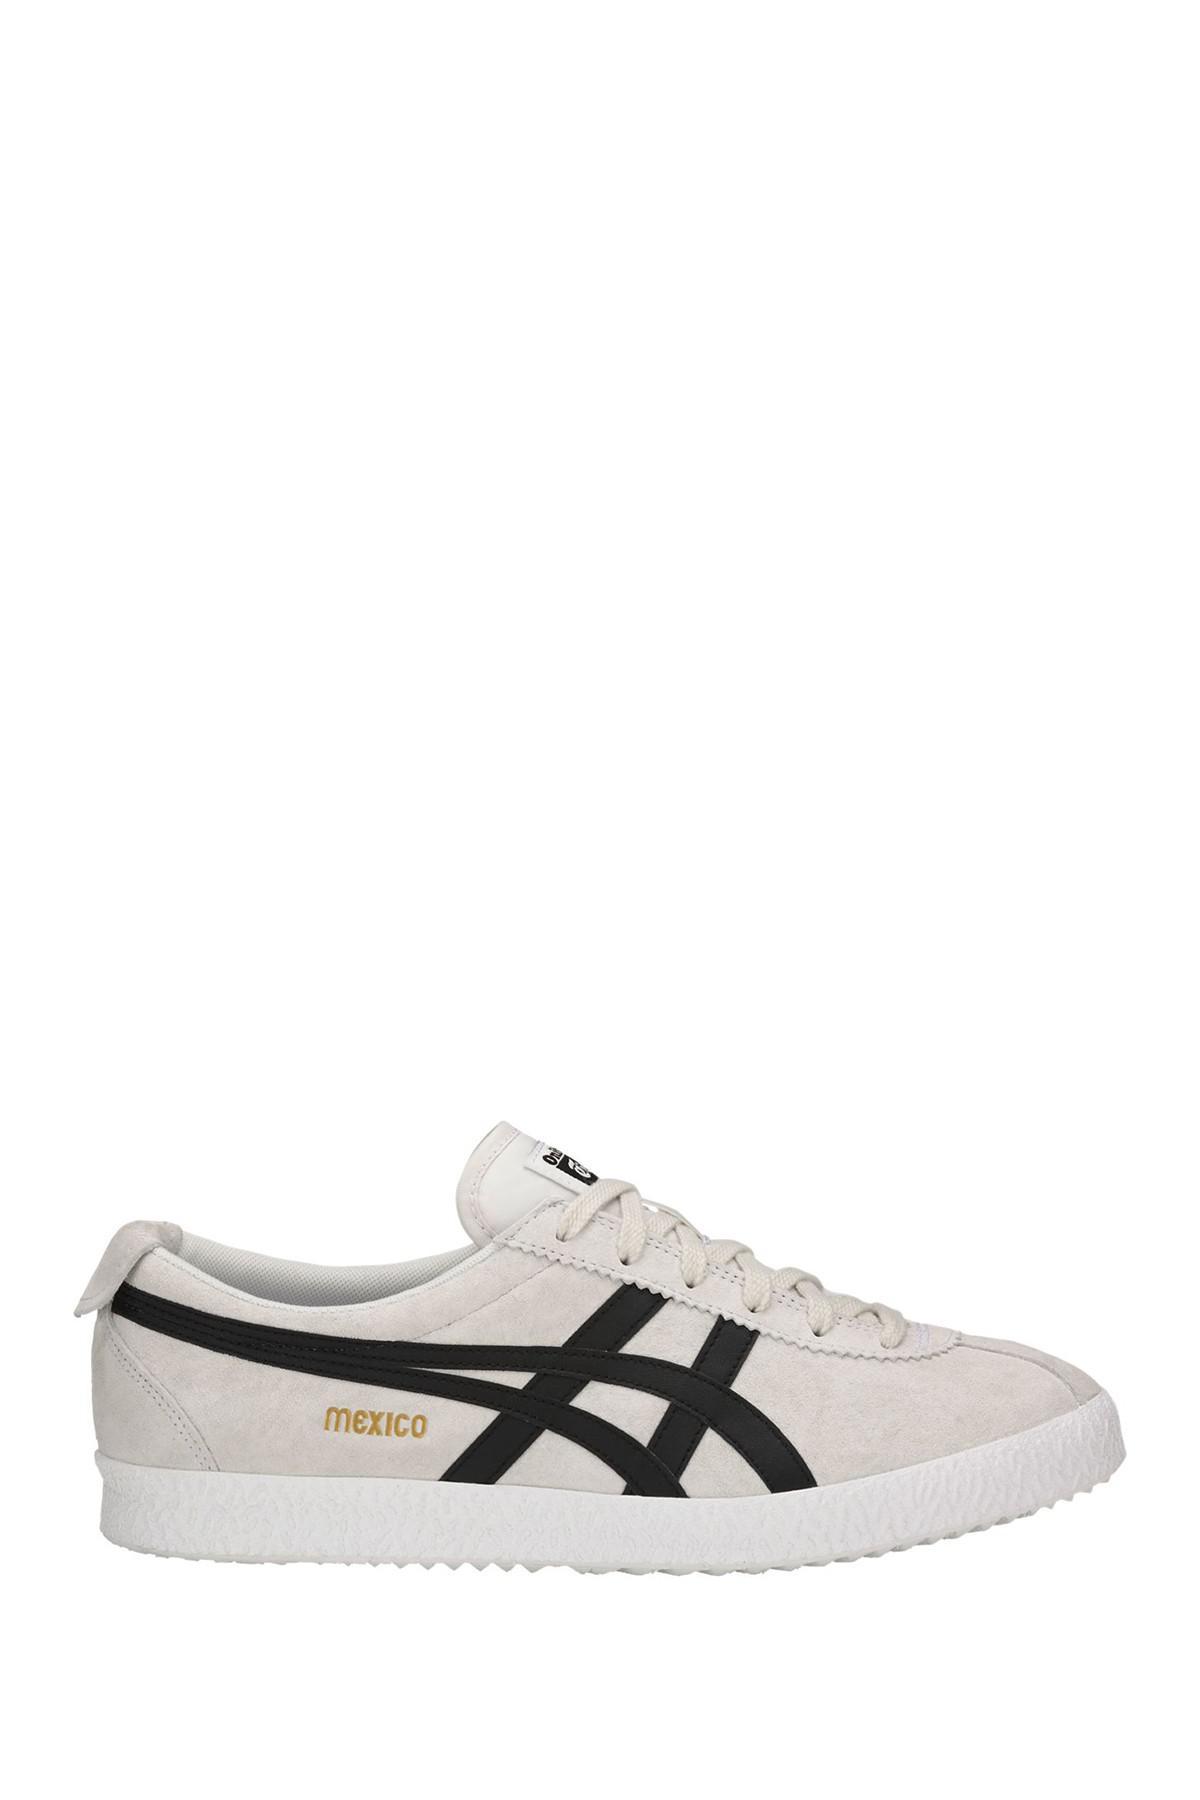 buy popular 9cbc4 089e4 Lyst - Asics Mexico Delegation Fashion Sneaker in Gray for Men